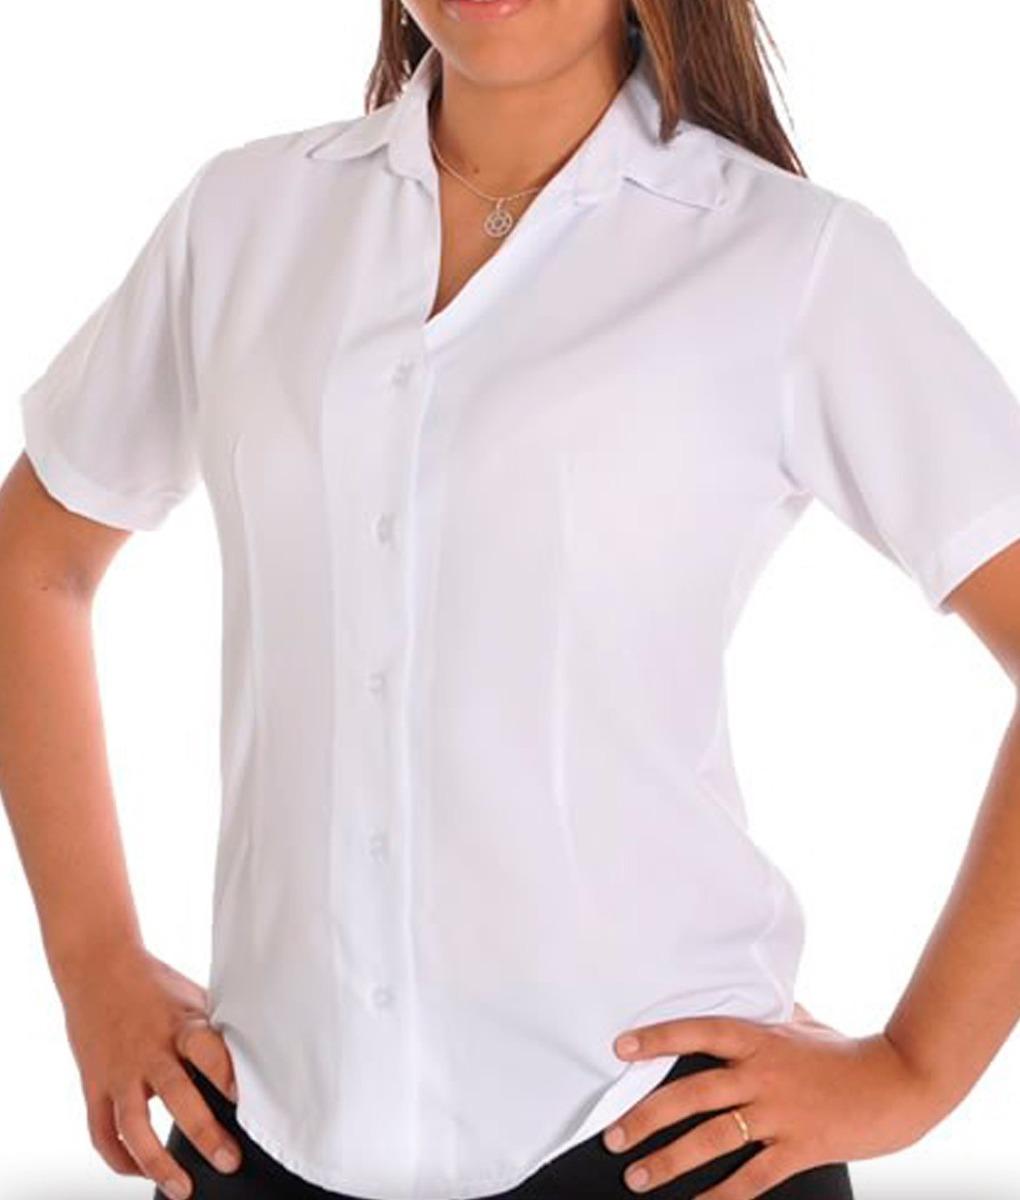 blusa feminina camisete social preço branco manga curta kit7. Carregando  zoom. 8d91c6ab4f35d